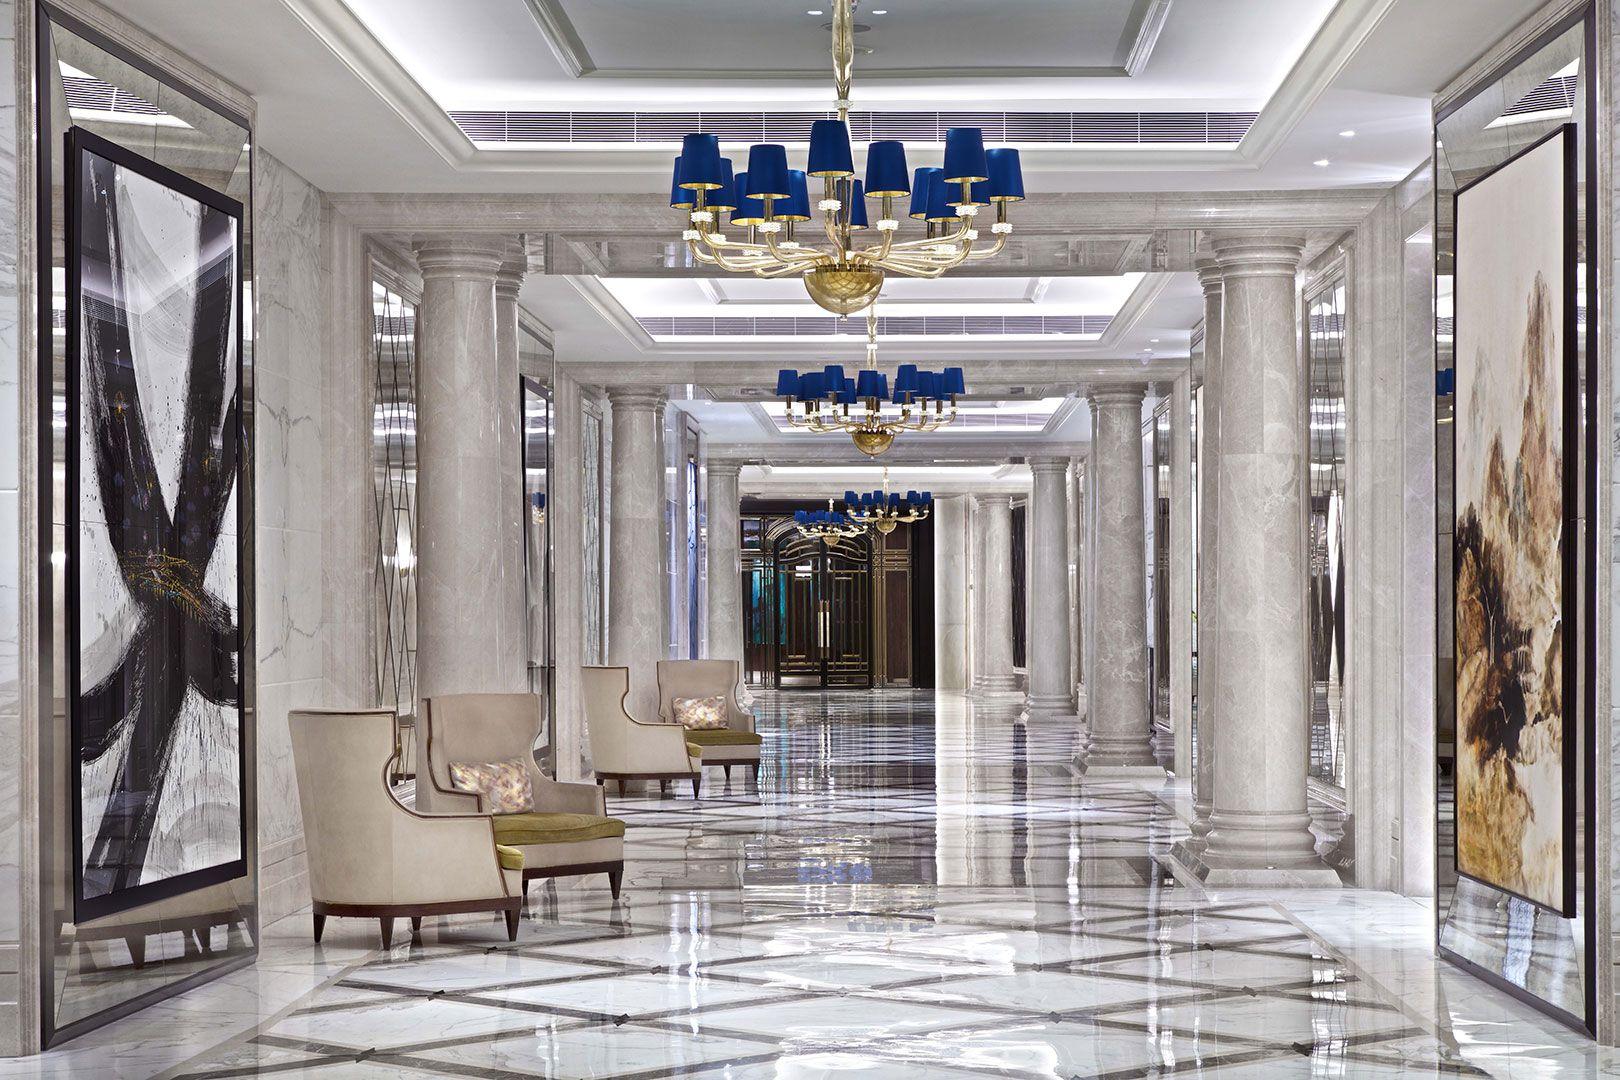 Hba ritz carlton galaxy macau galaxy project hotel - Interior arrangement and design association ...